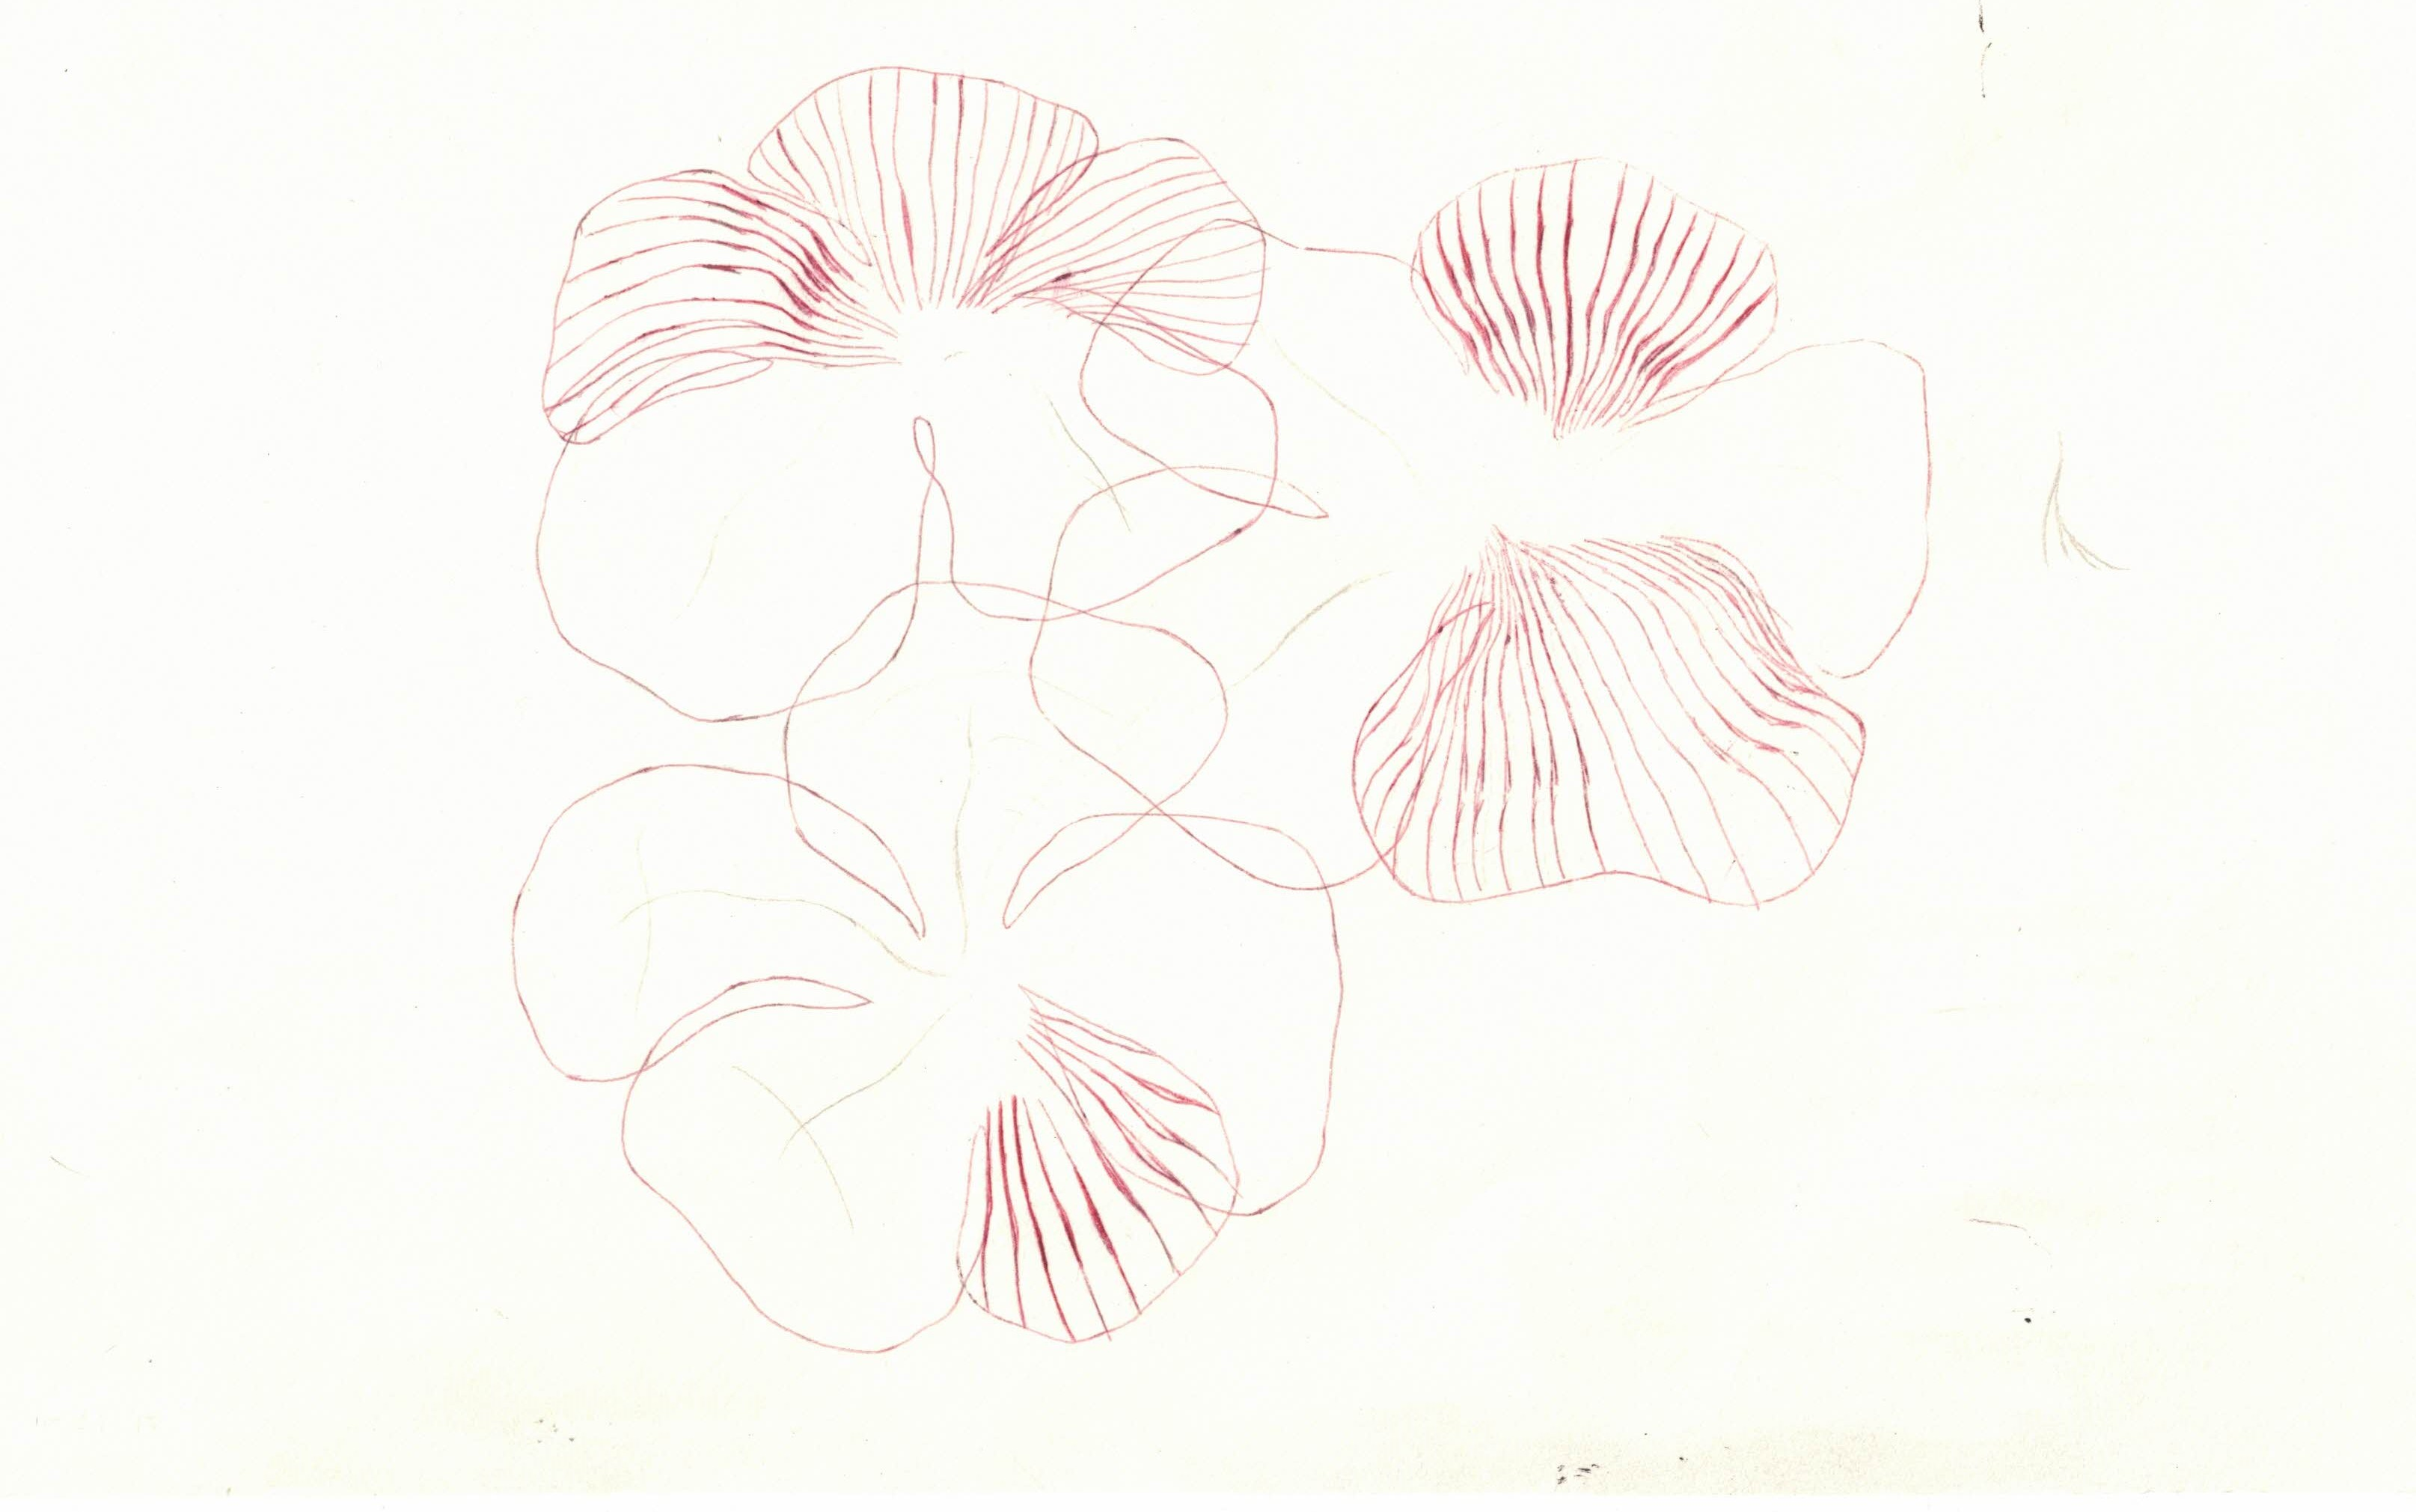 flowers ii, edit i, wilted study (3)